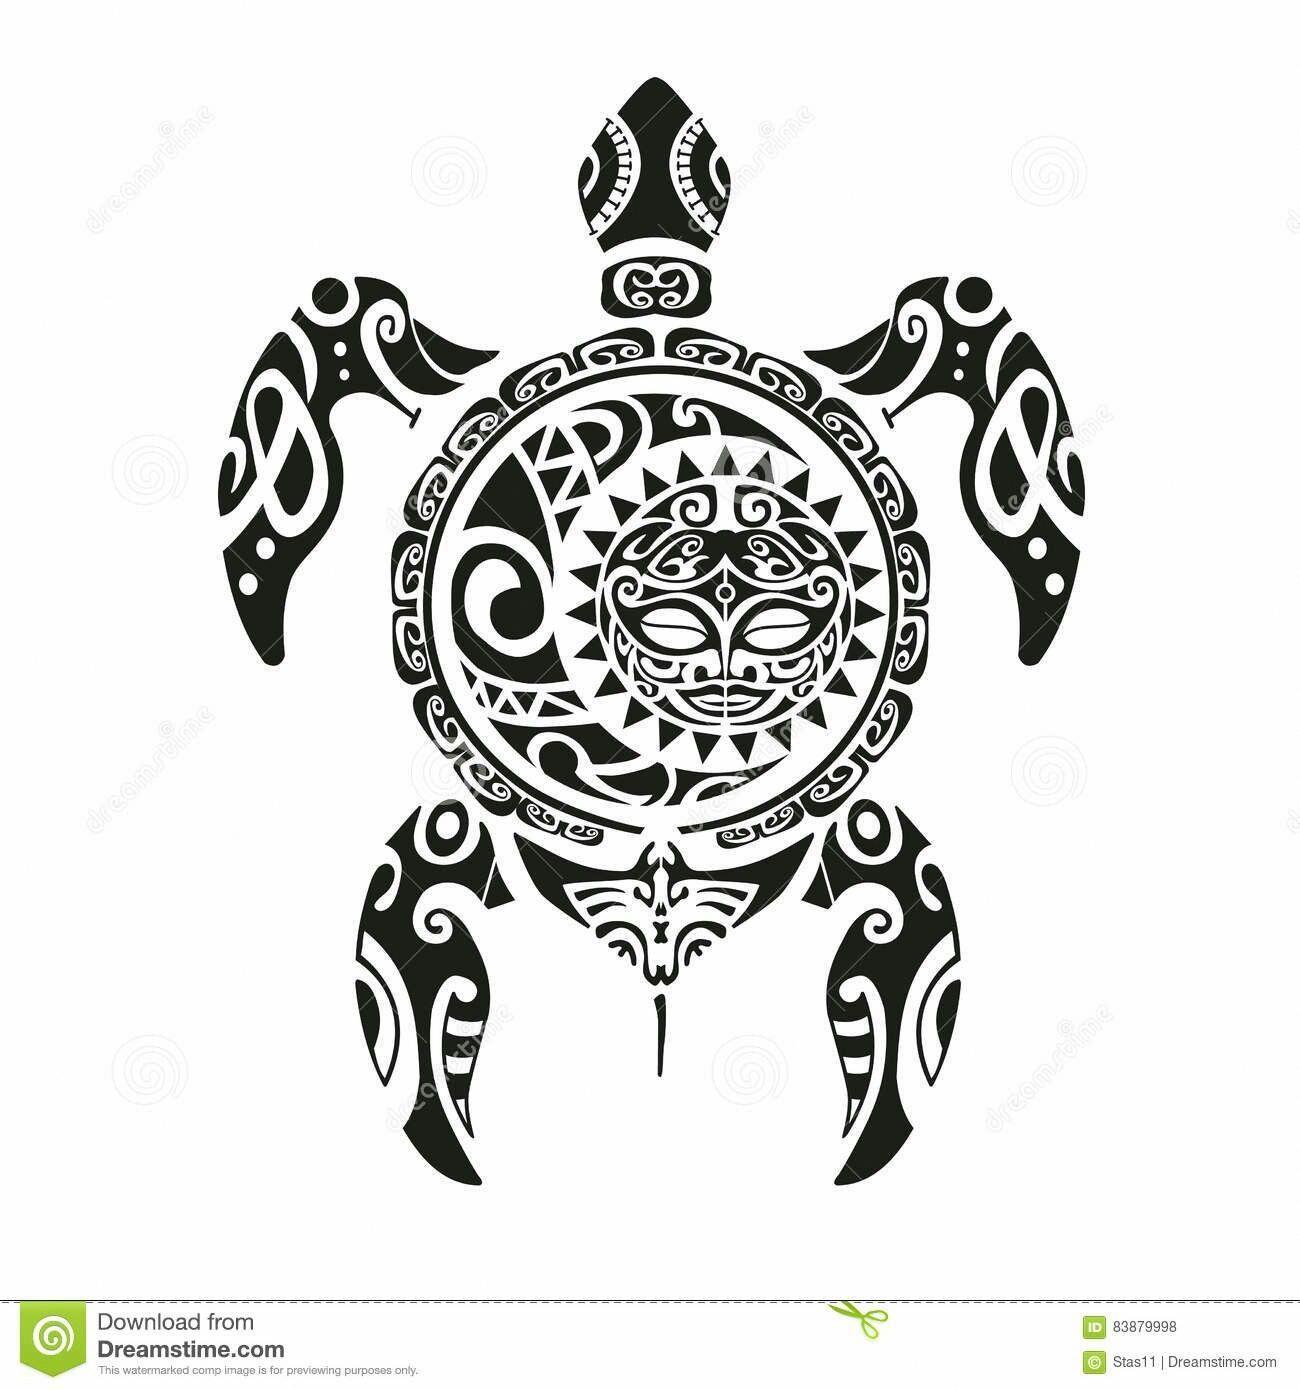 964603d93 meaning behind polynesian tattoos #Polynesiantattoos | Polynesian ...